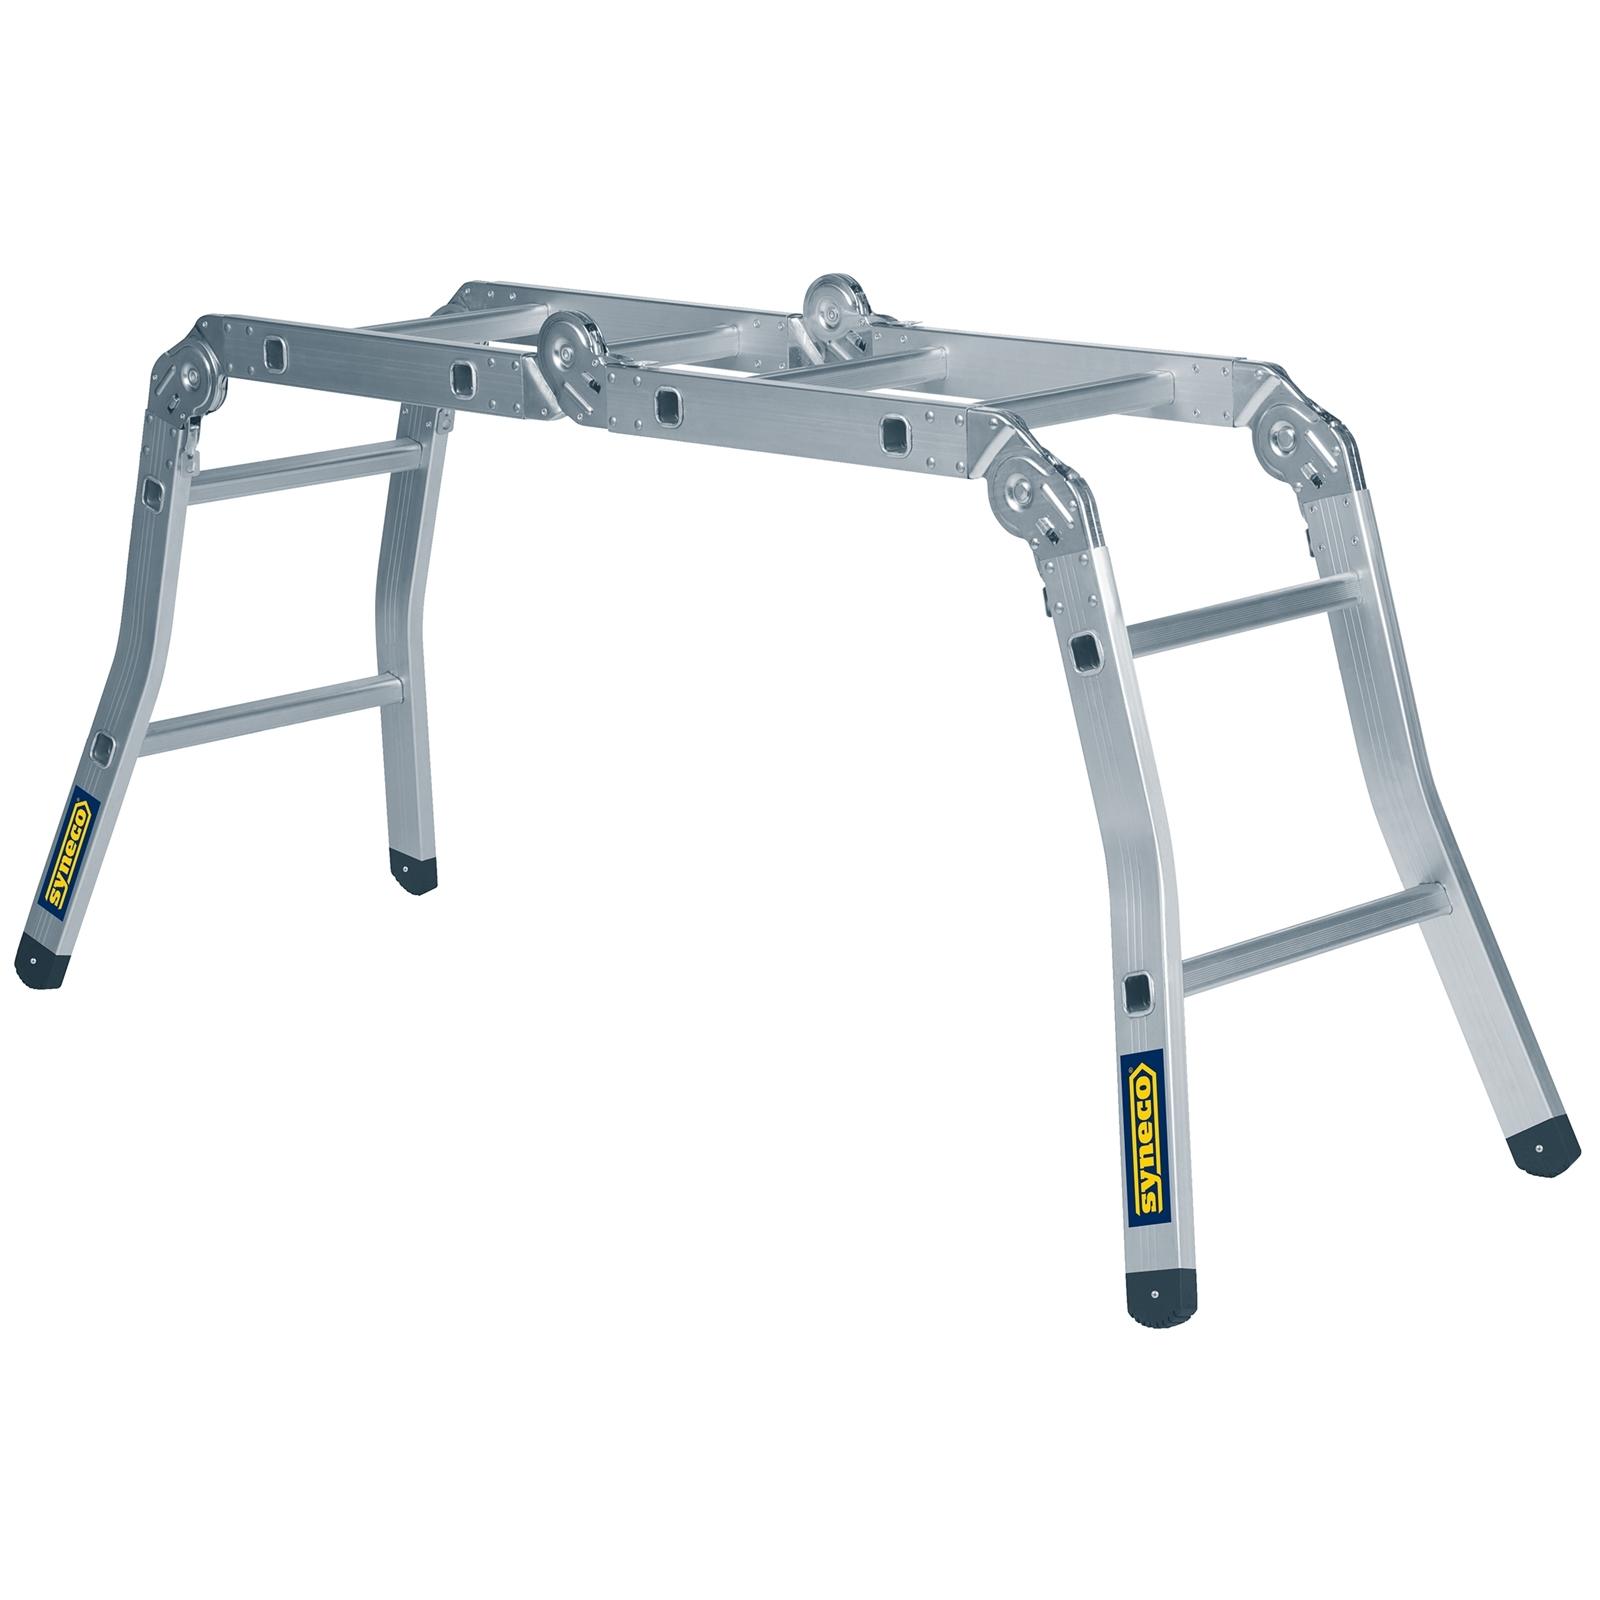 Syneco 2.5m 120kg Weight Capacity Multi Purpose Folding Aluminium Ladder